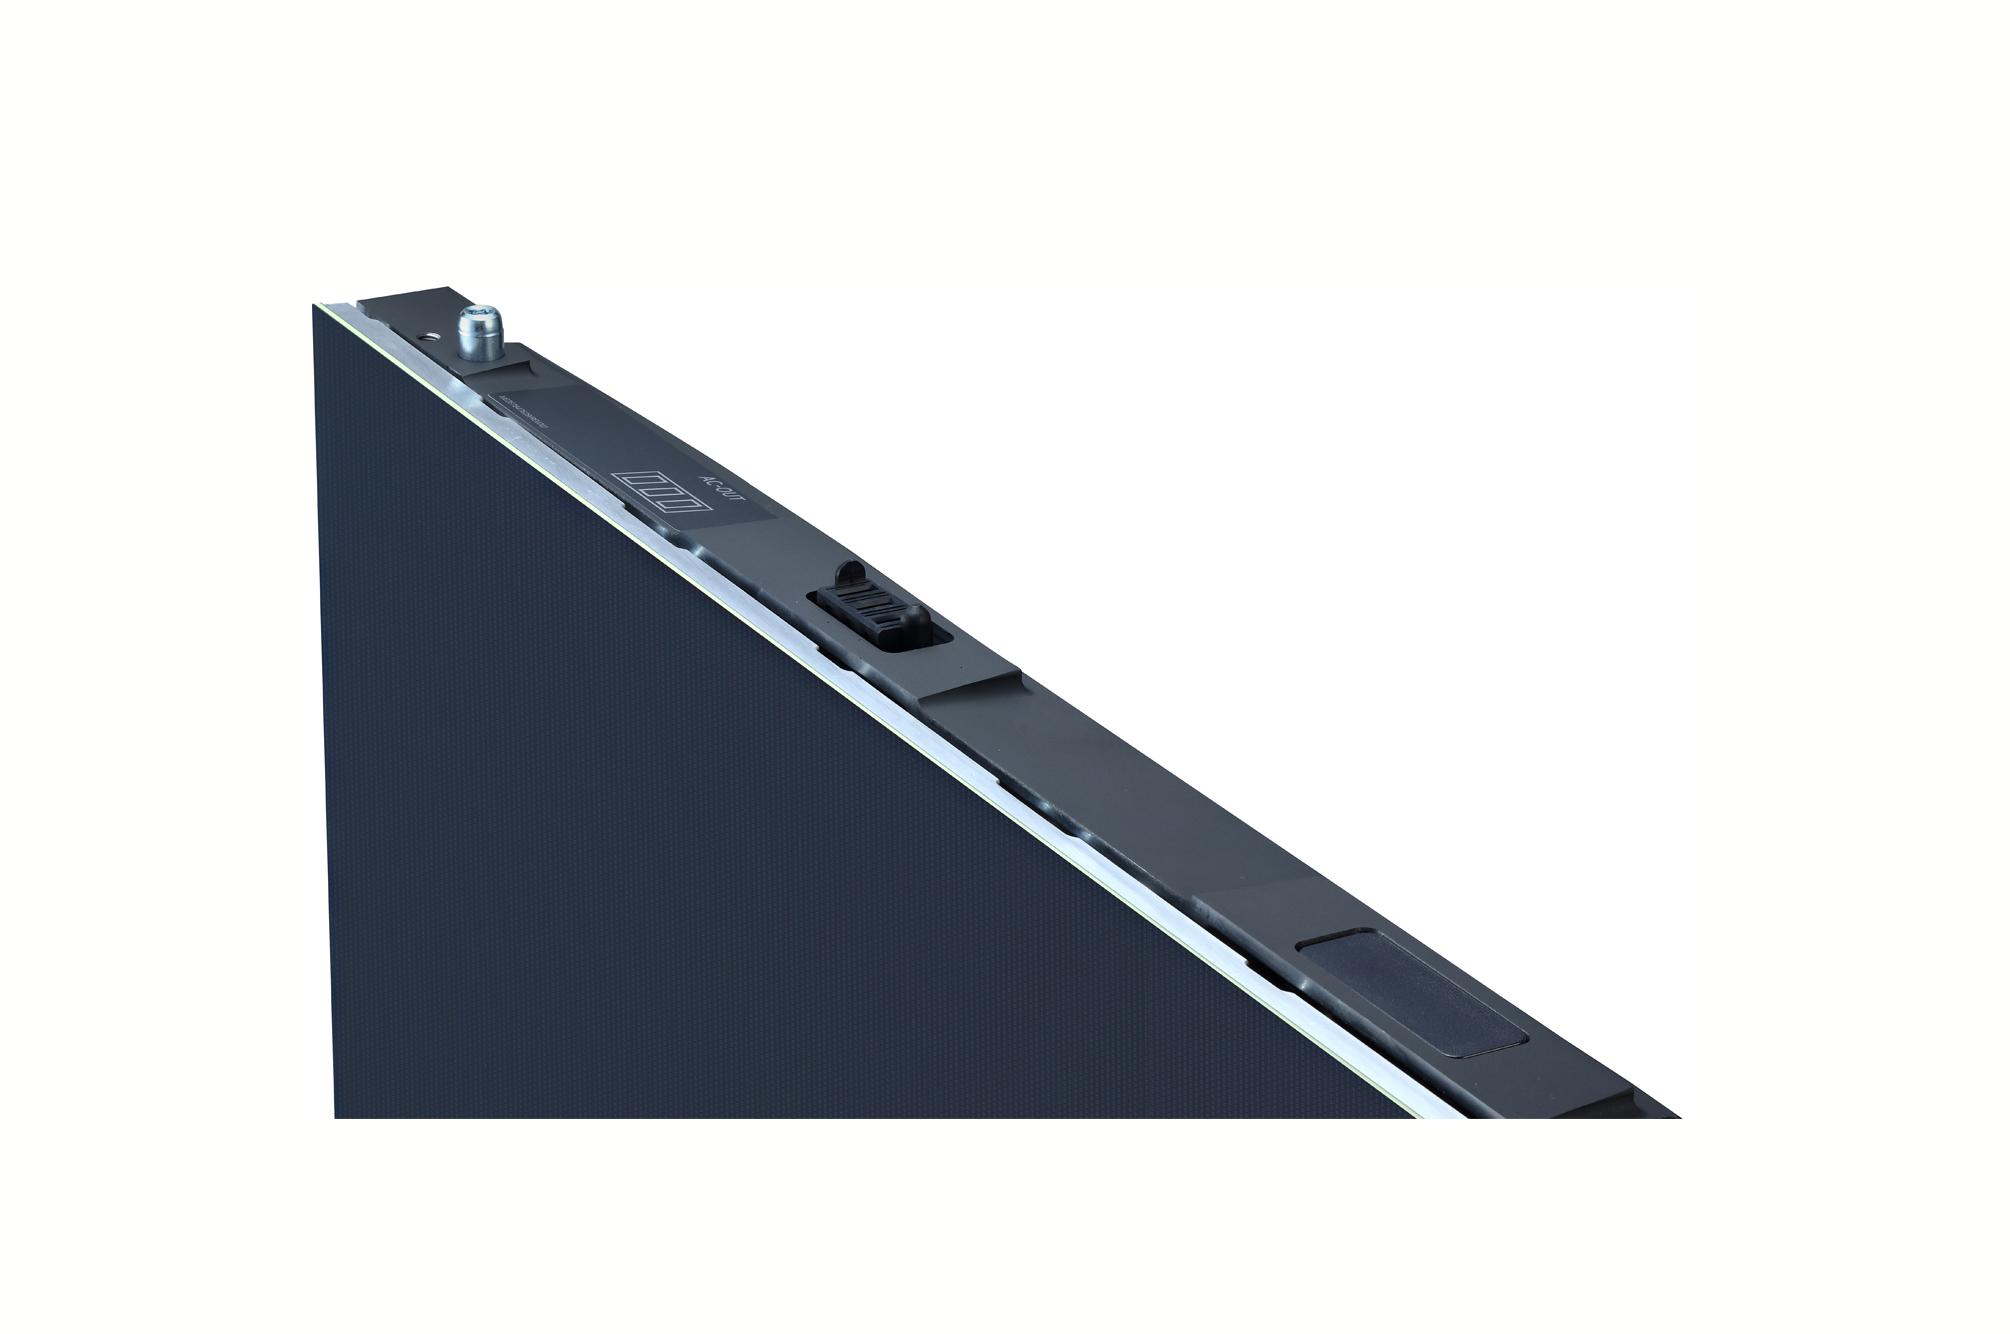 LG LG MAGNIT LSAB009 8